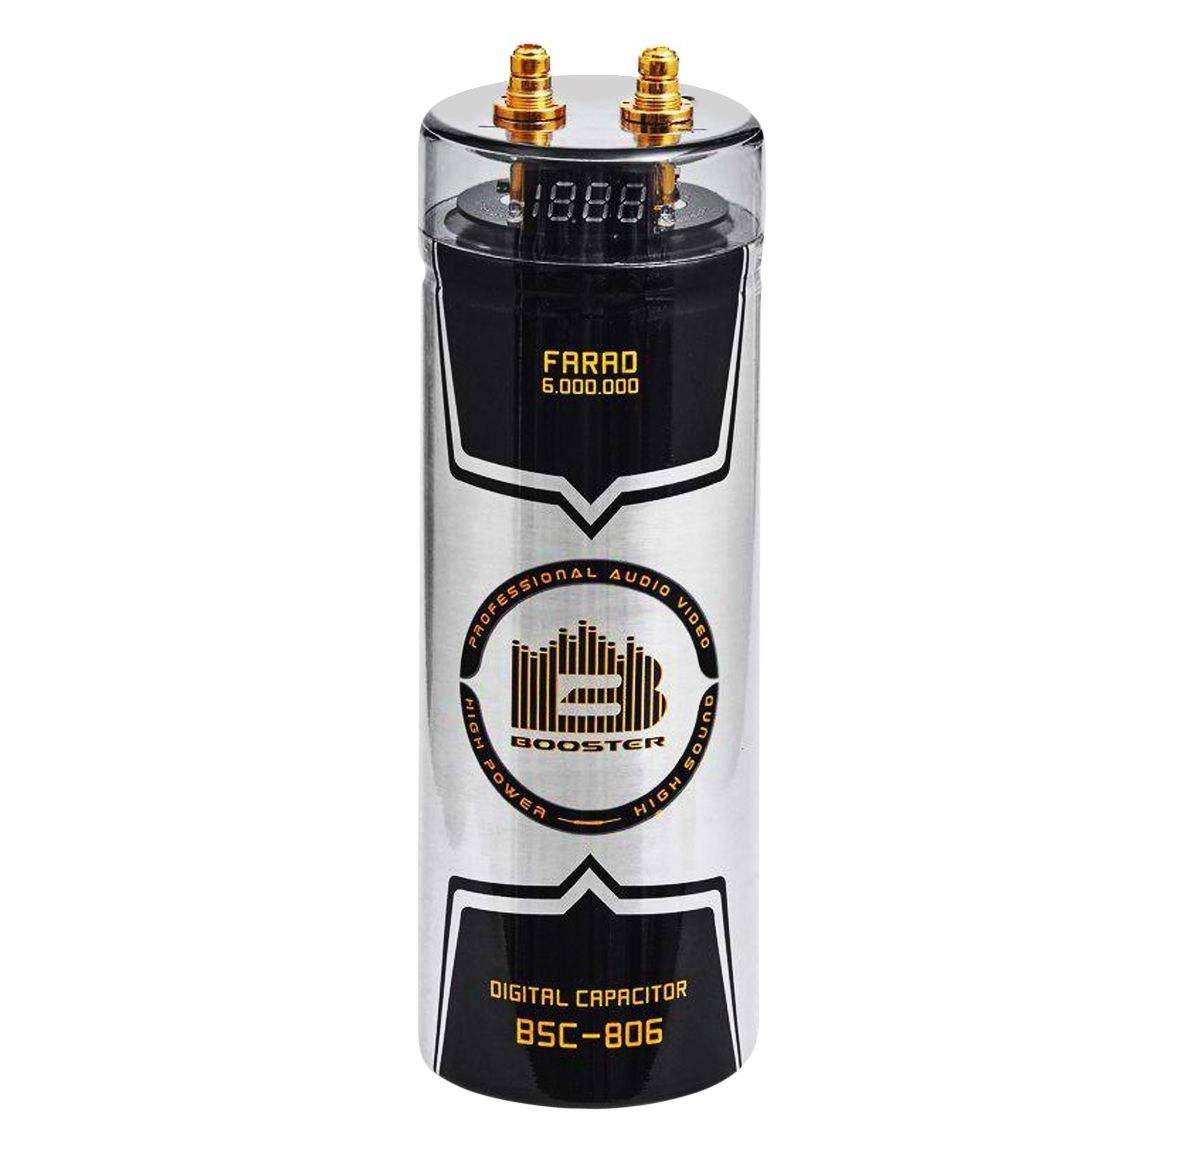 خازن 5 فاراد بوستر - Booster BSC-805